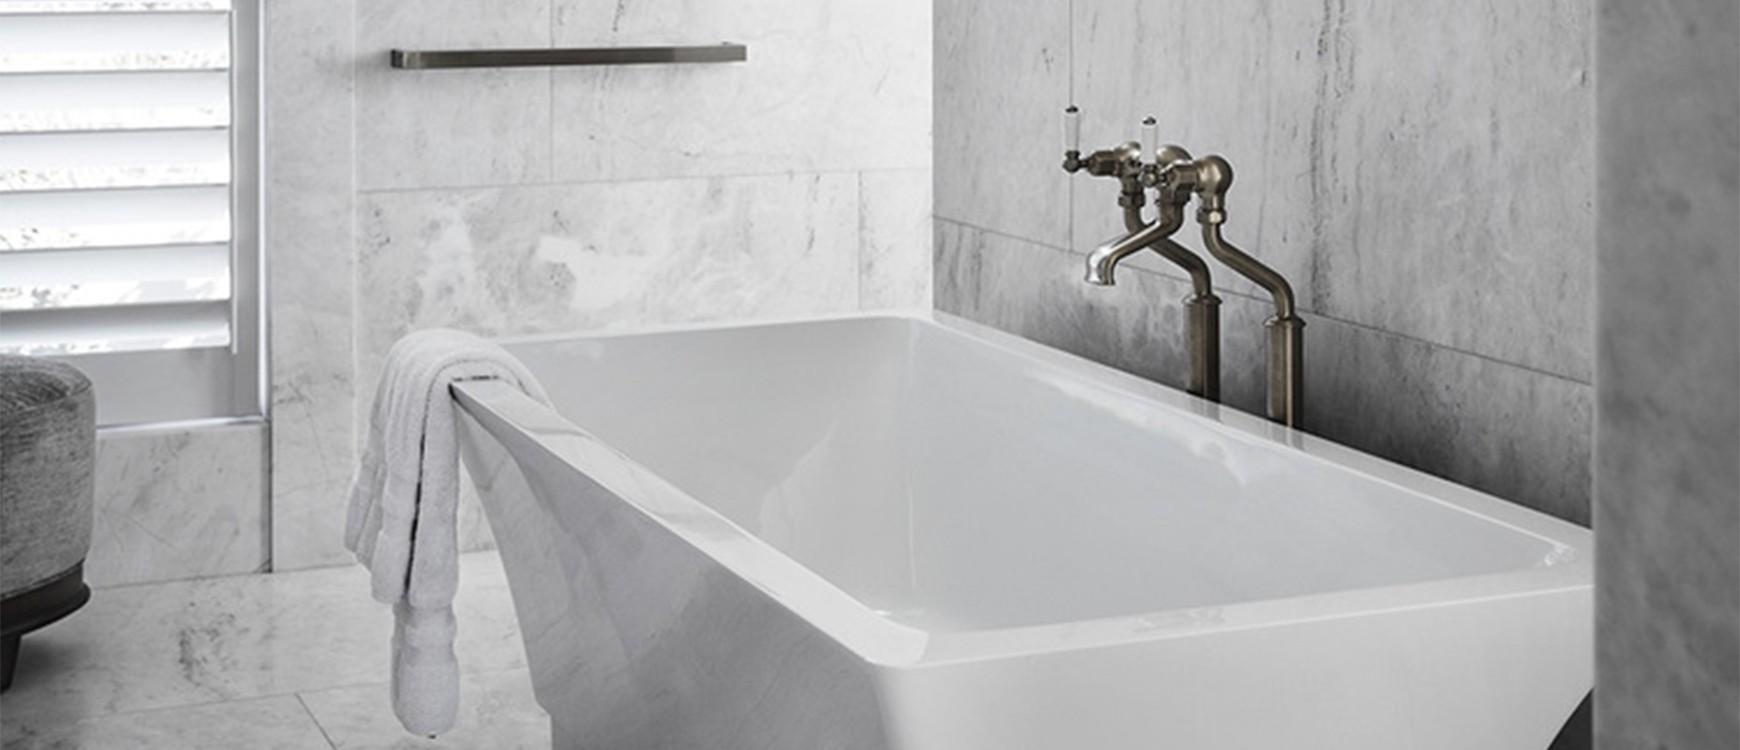 Concrete Bathroom | Designer Tapware | Alexandra Kidd Design | The ...